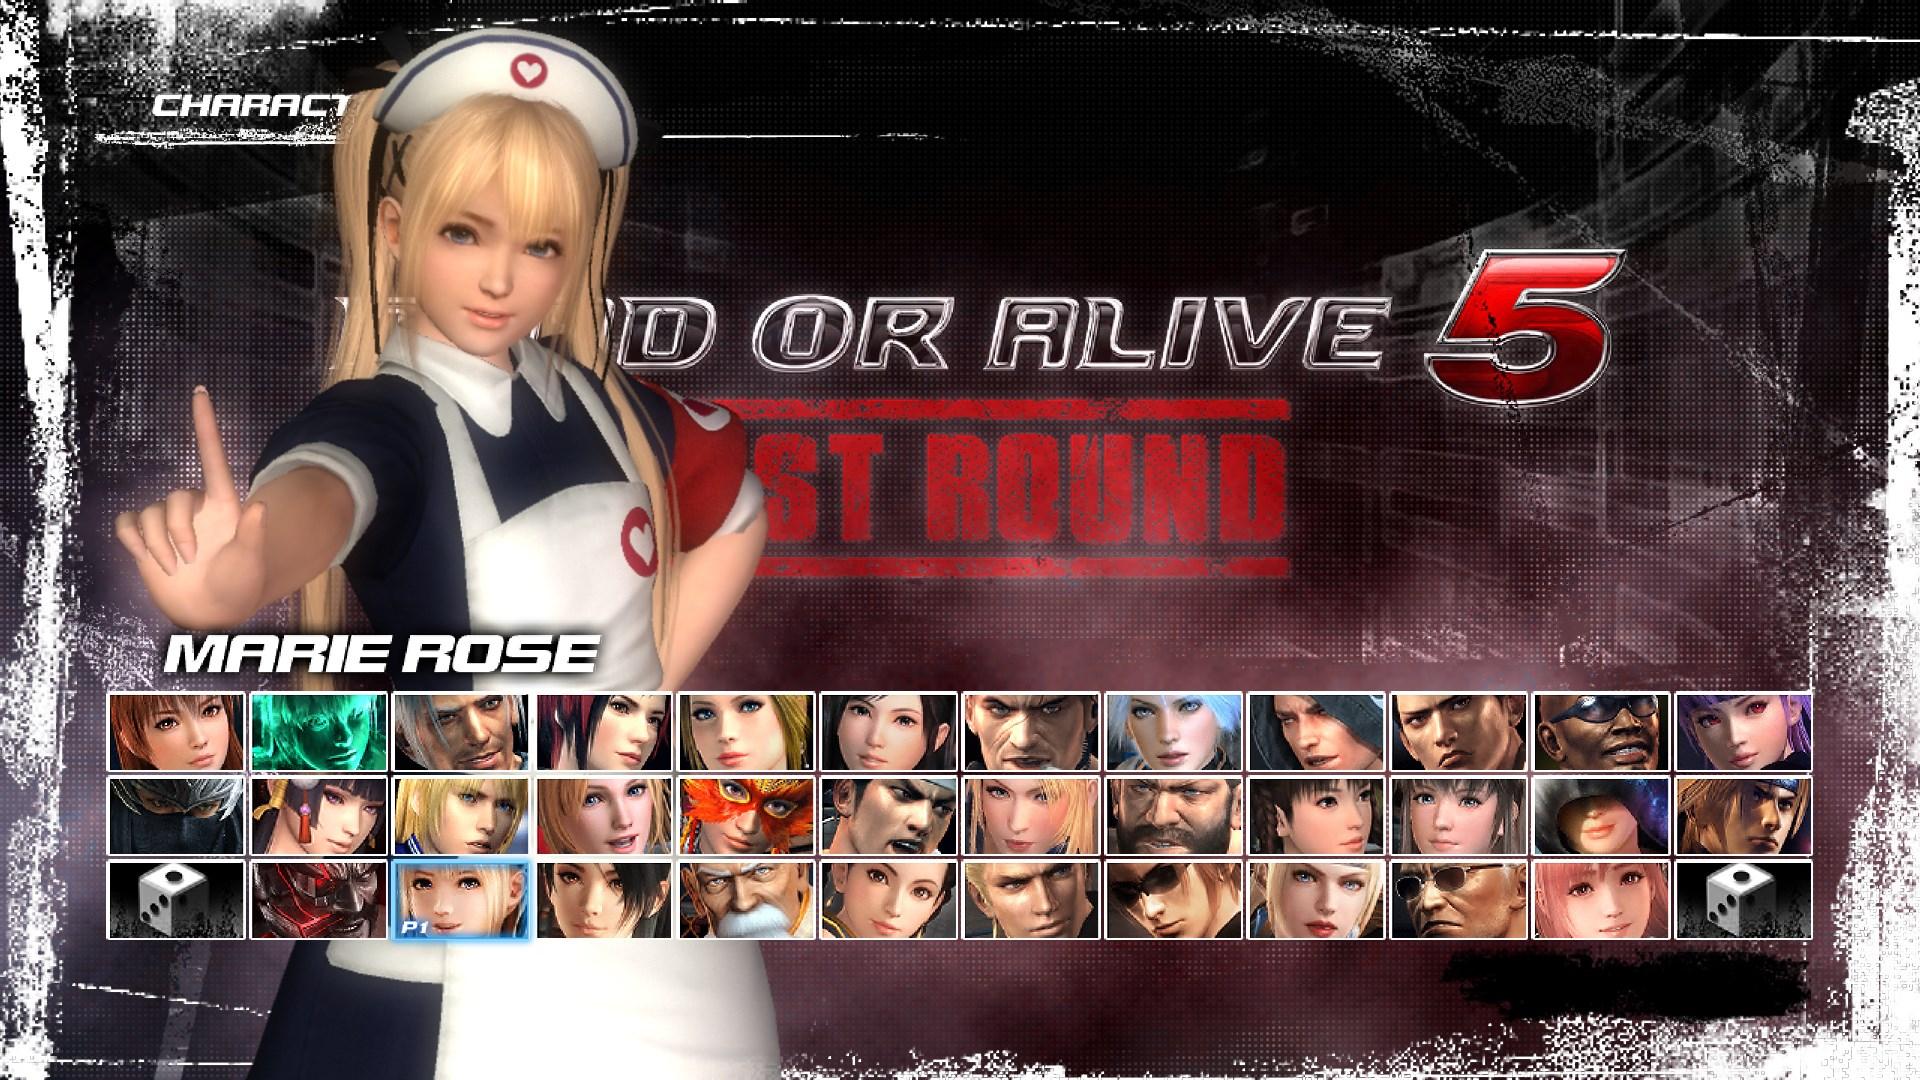 Traje de enfermera de Marie Rose